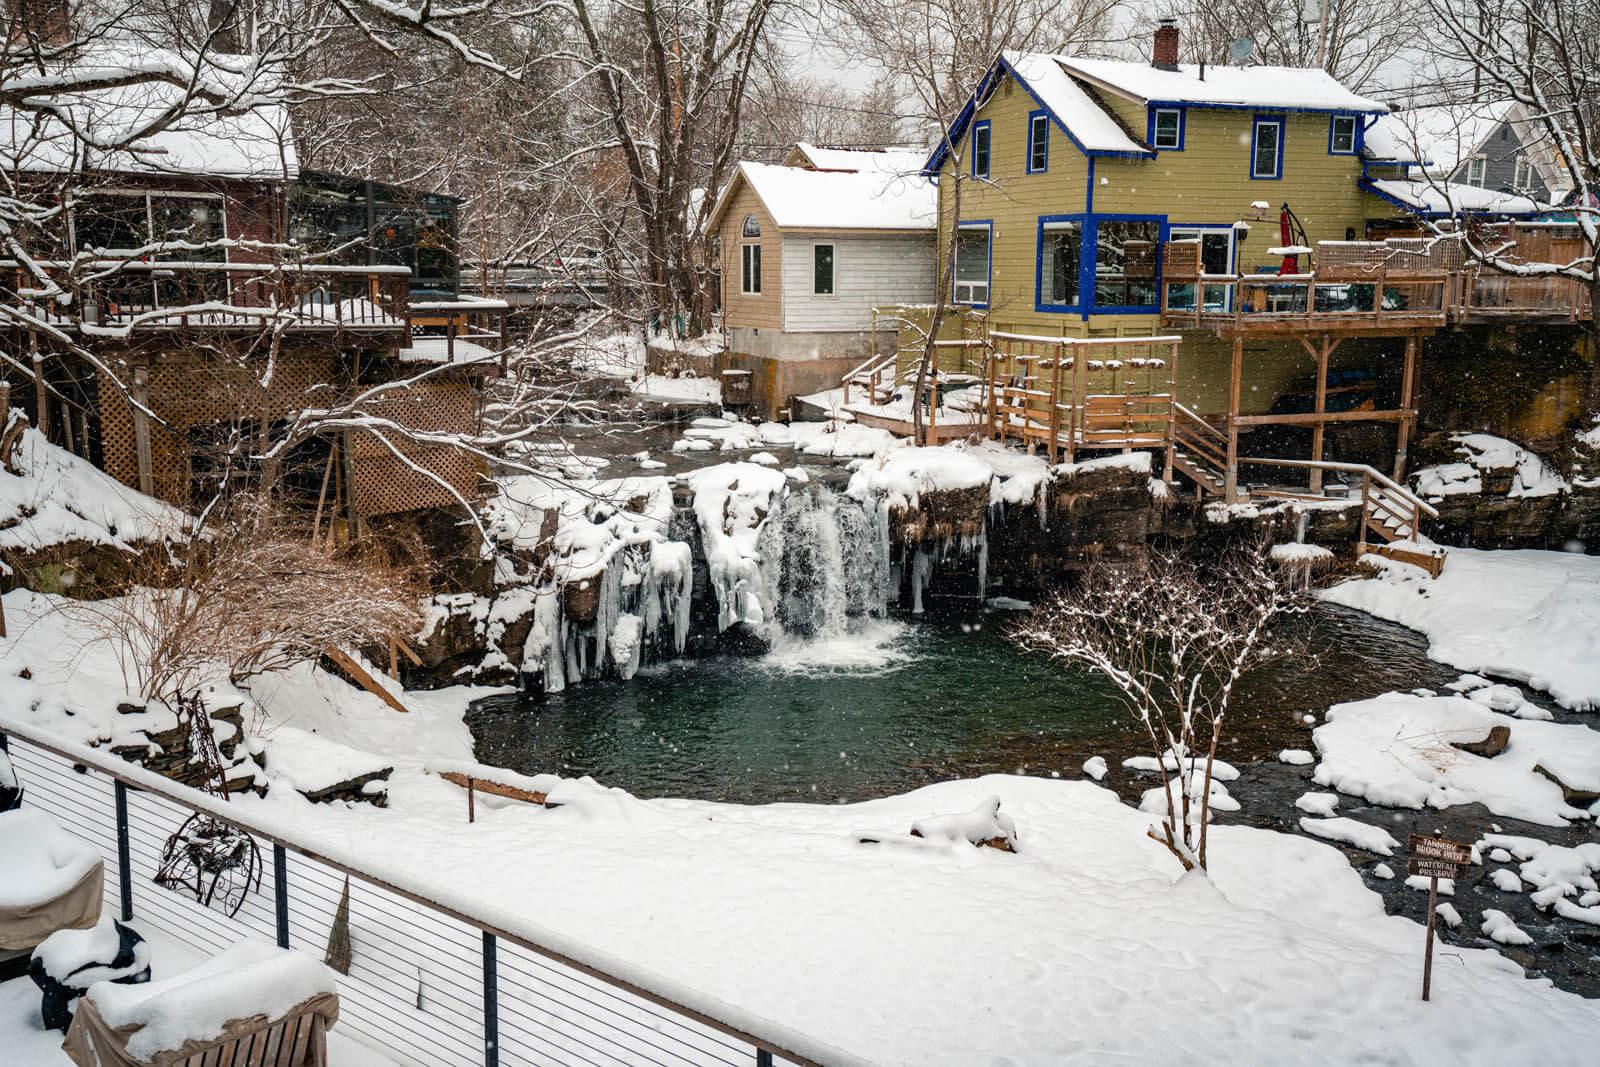 Woodstock Waterfall Park in the Catskills New York